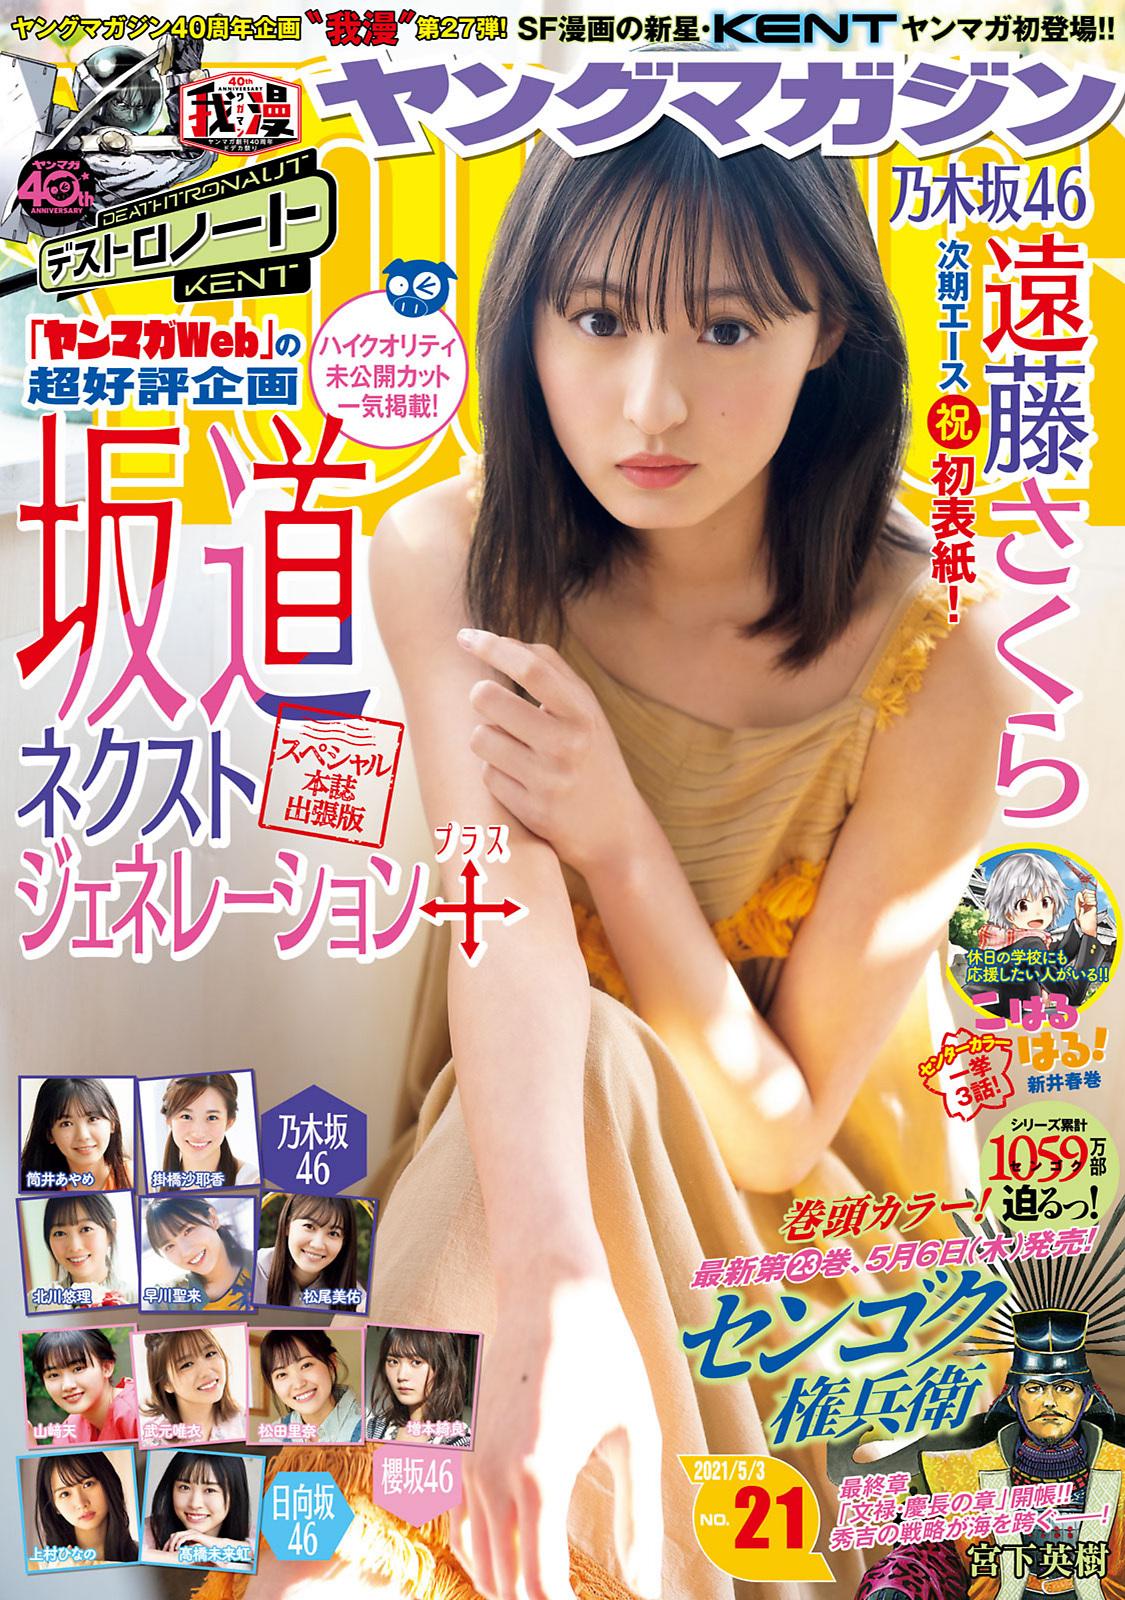 [Young Magazine] 2021 No.21 遠藤さくら